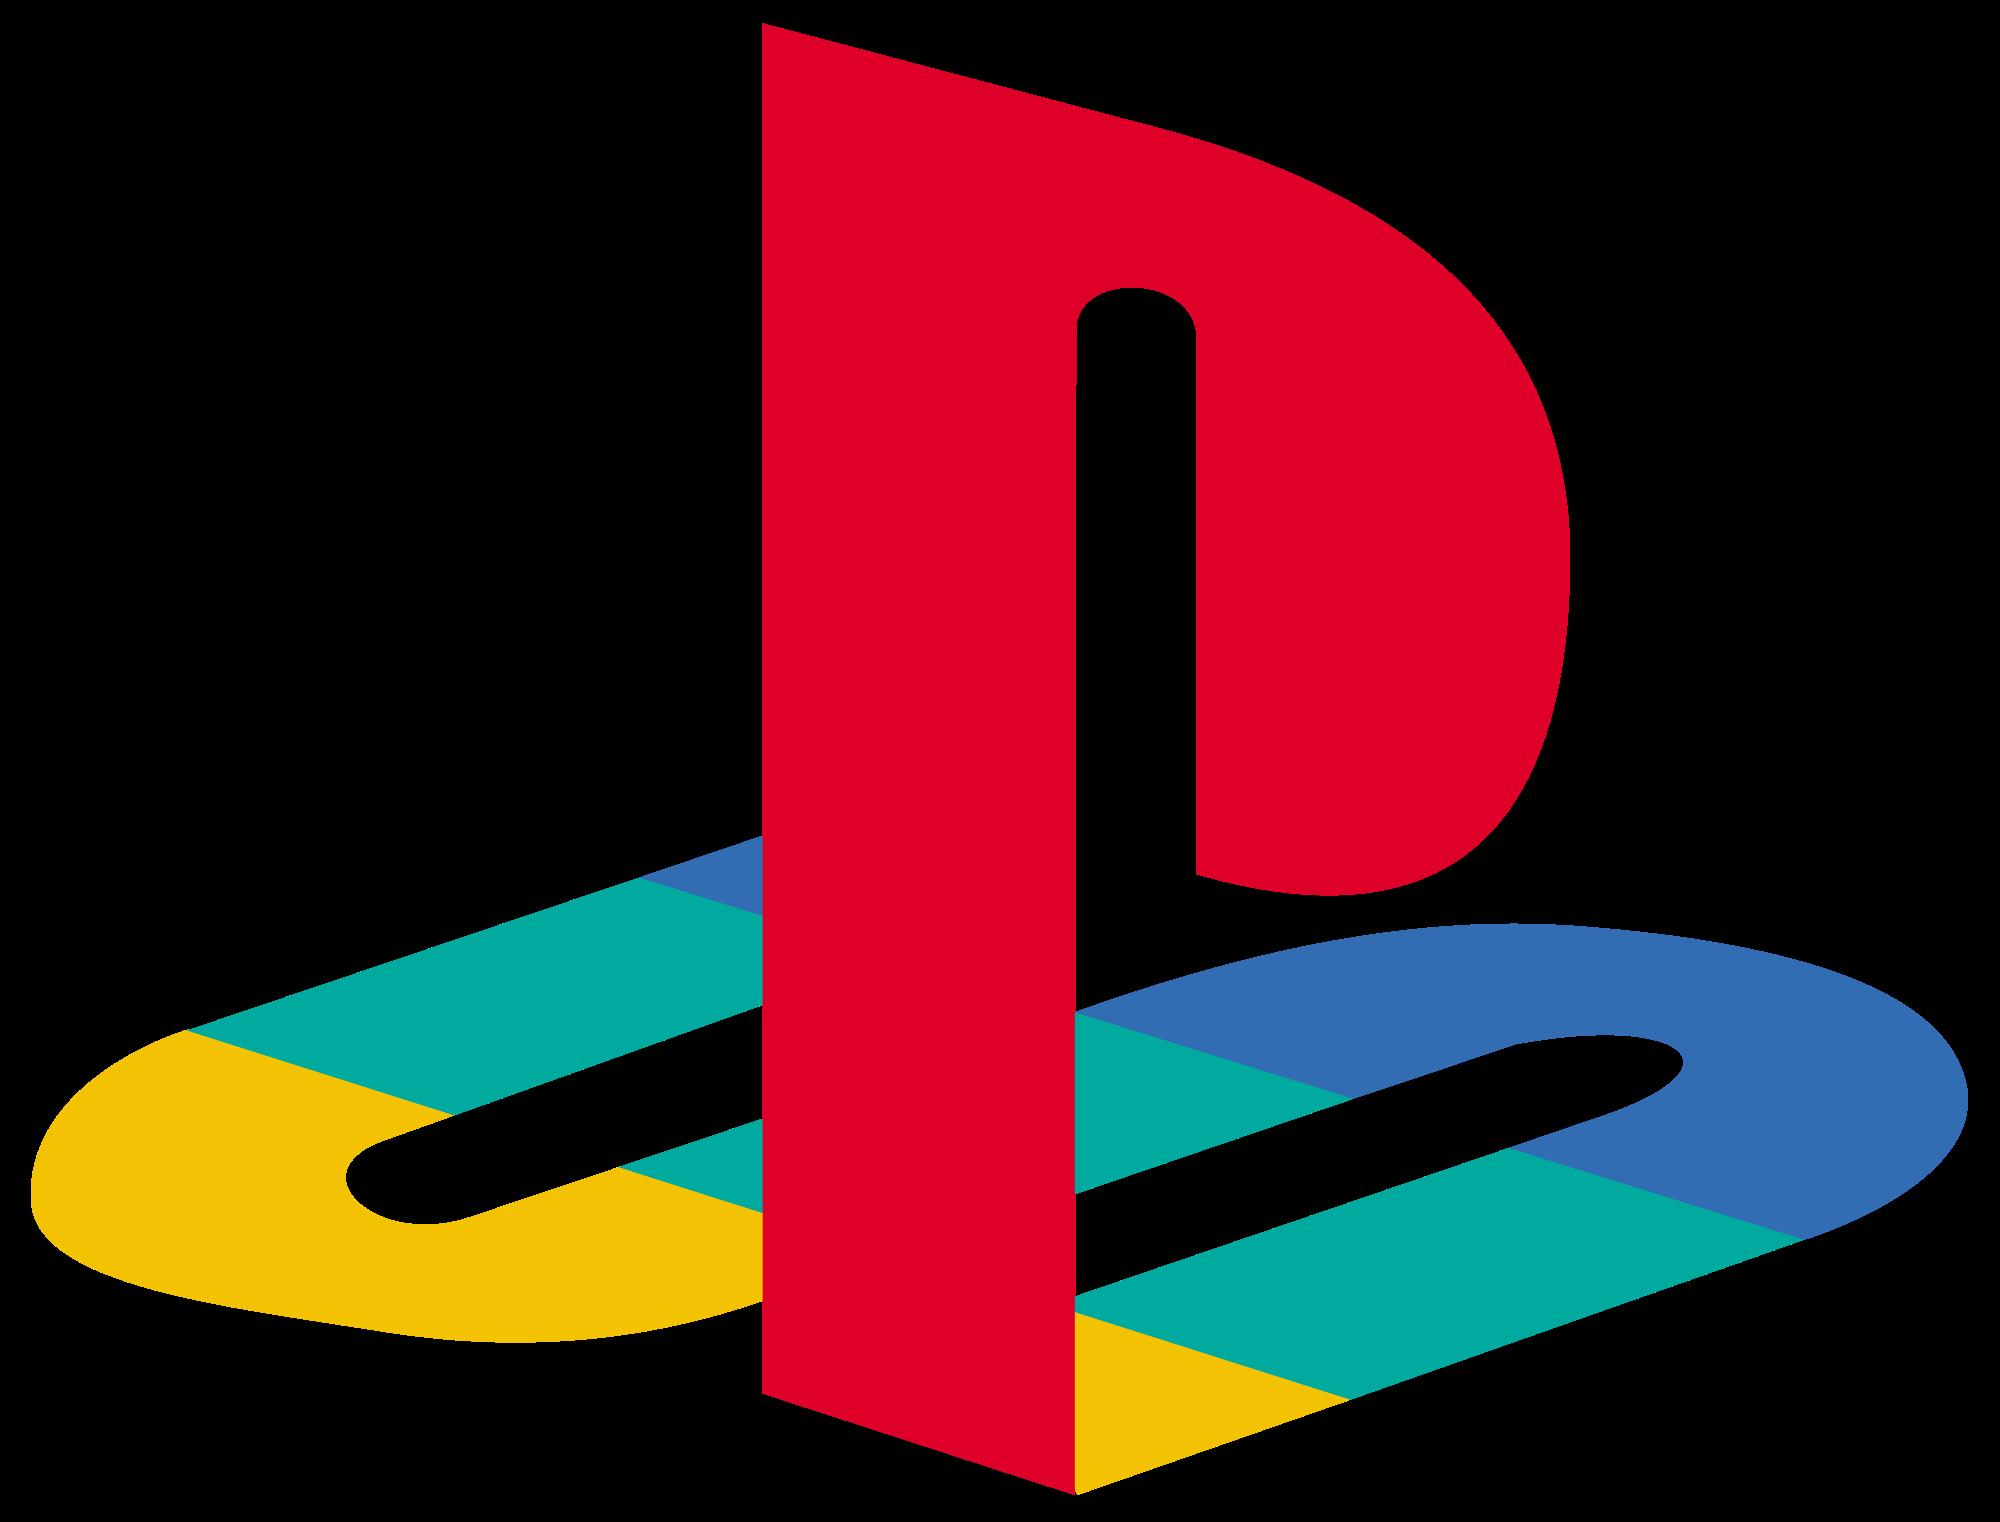 sony playstation 1 logo. playstation 1 logo.png sony playstation logo l